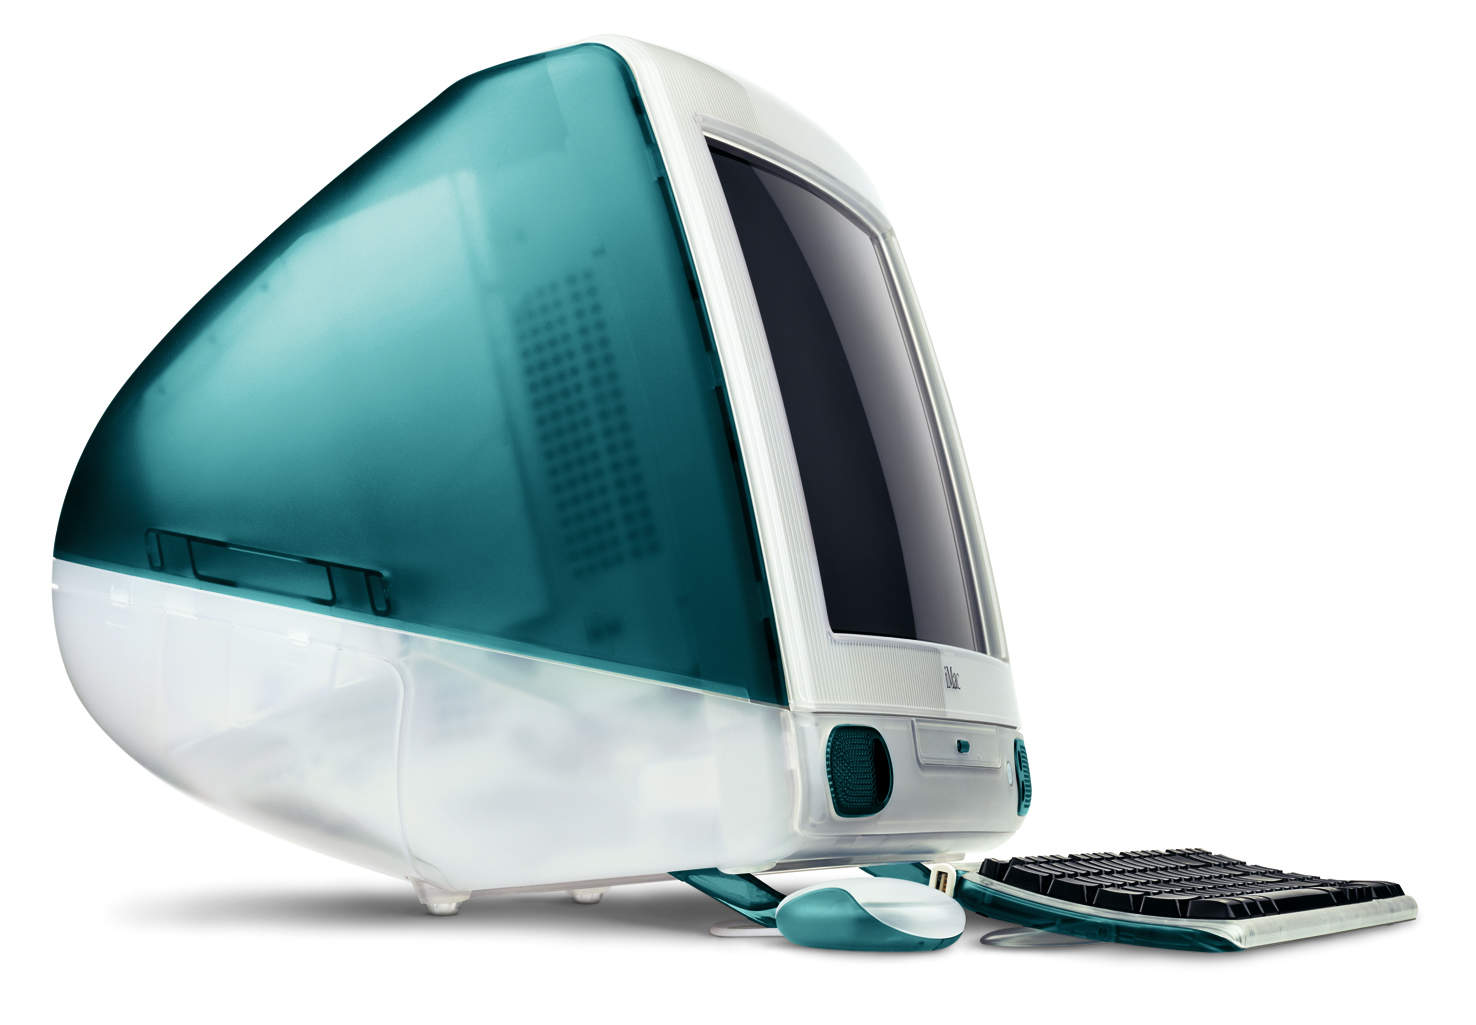 iMac-Bondi-Blue-1998